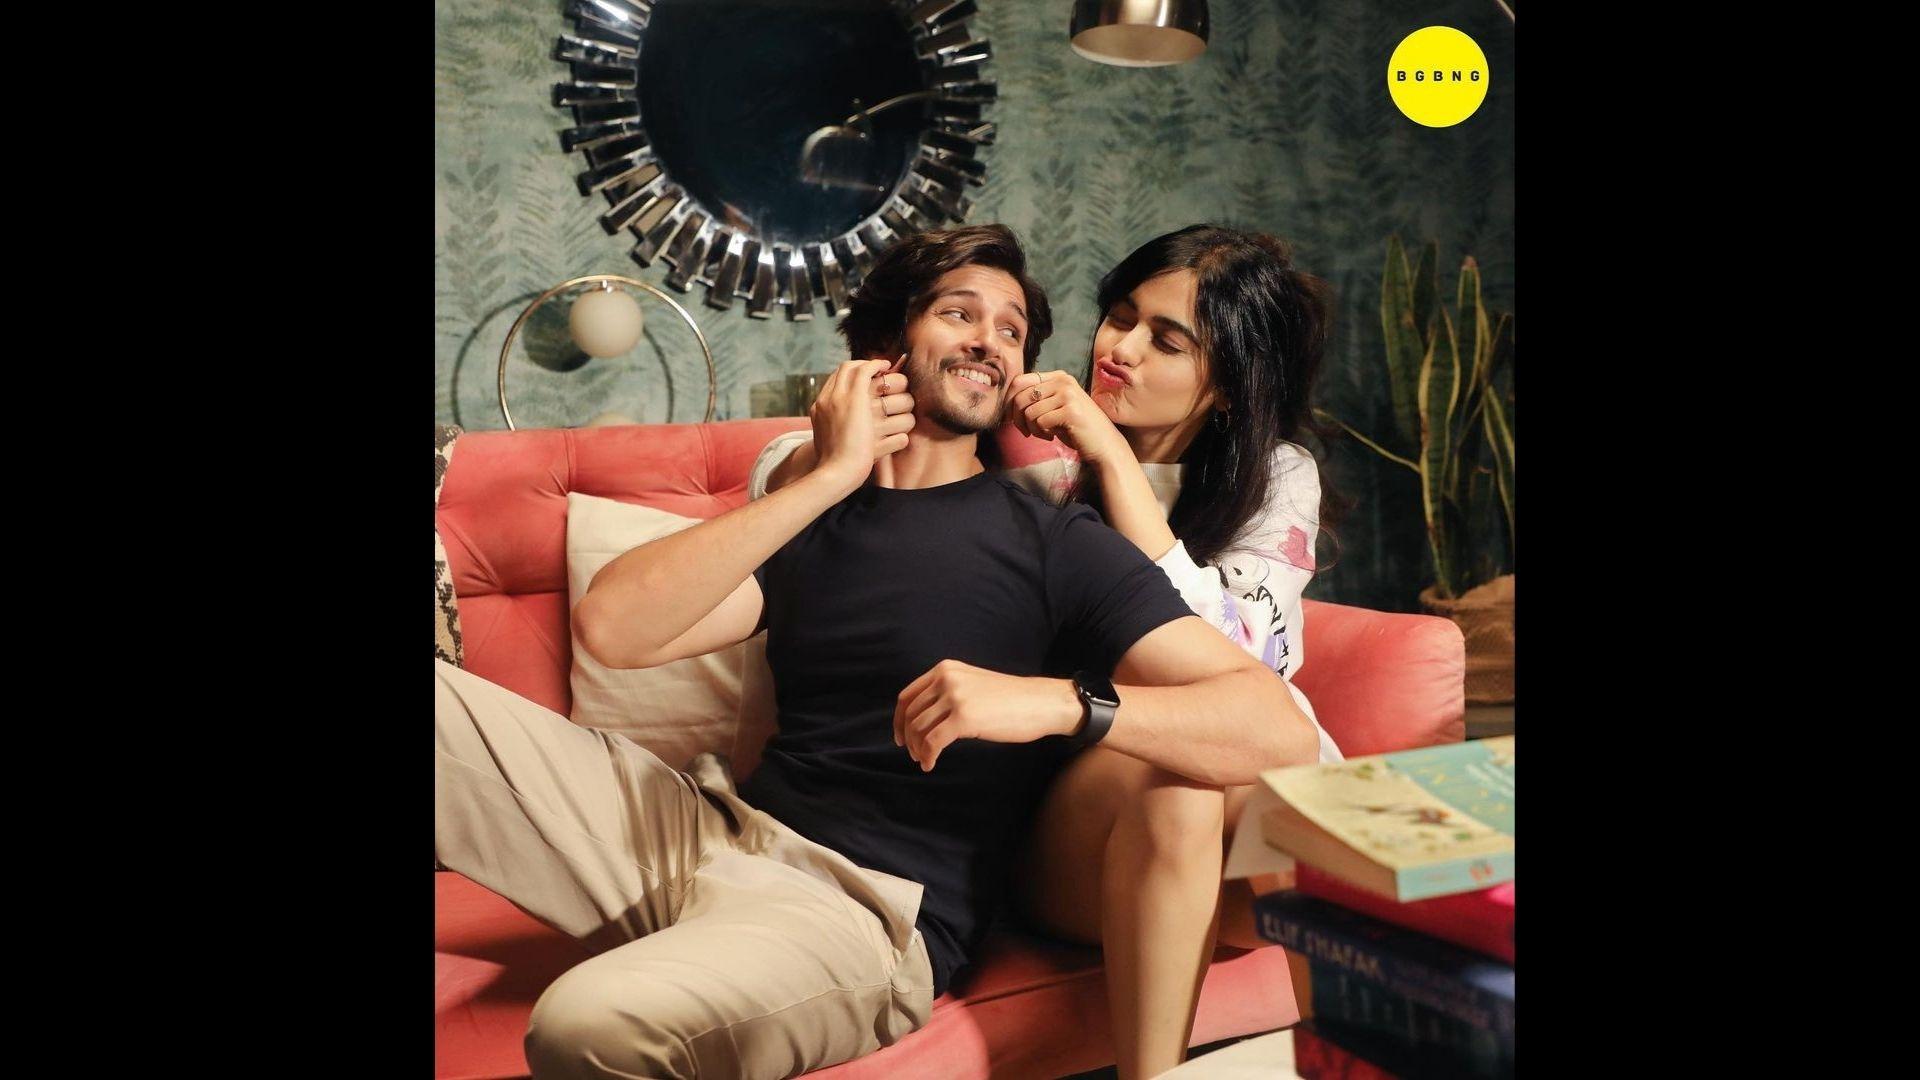 Sorry Sorry Poster: Adah Sharma And Rohan Mehra's New Love Track Feels Like Innocent Romance